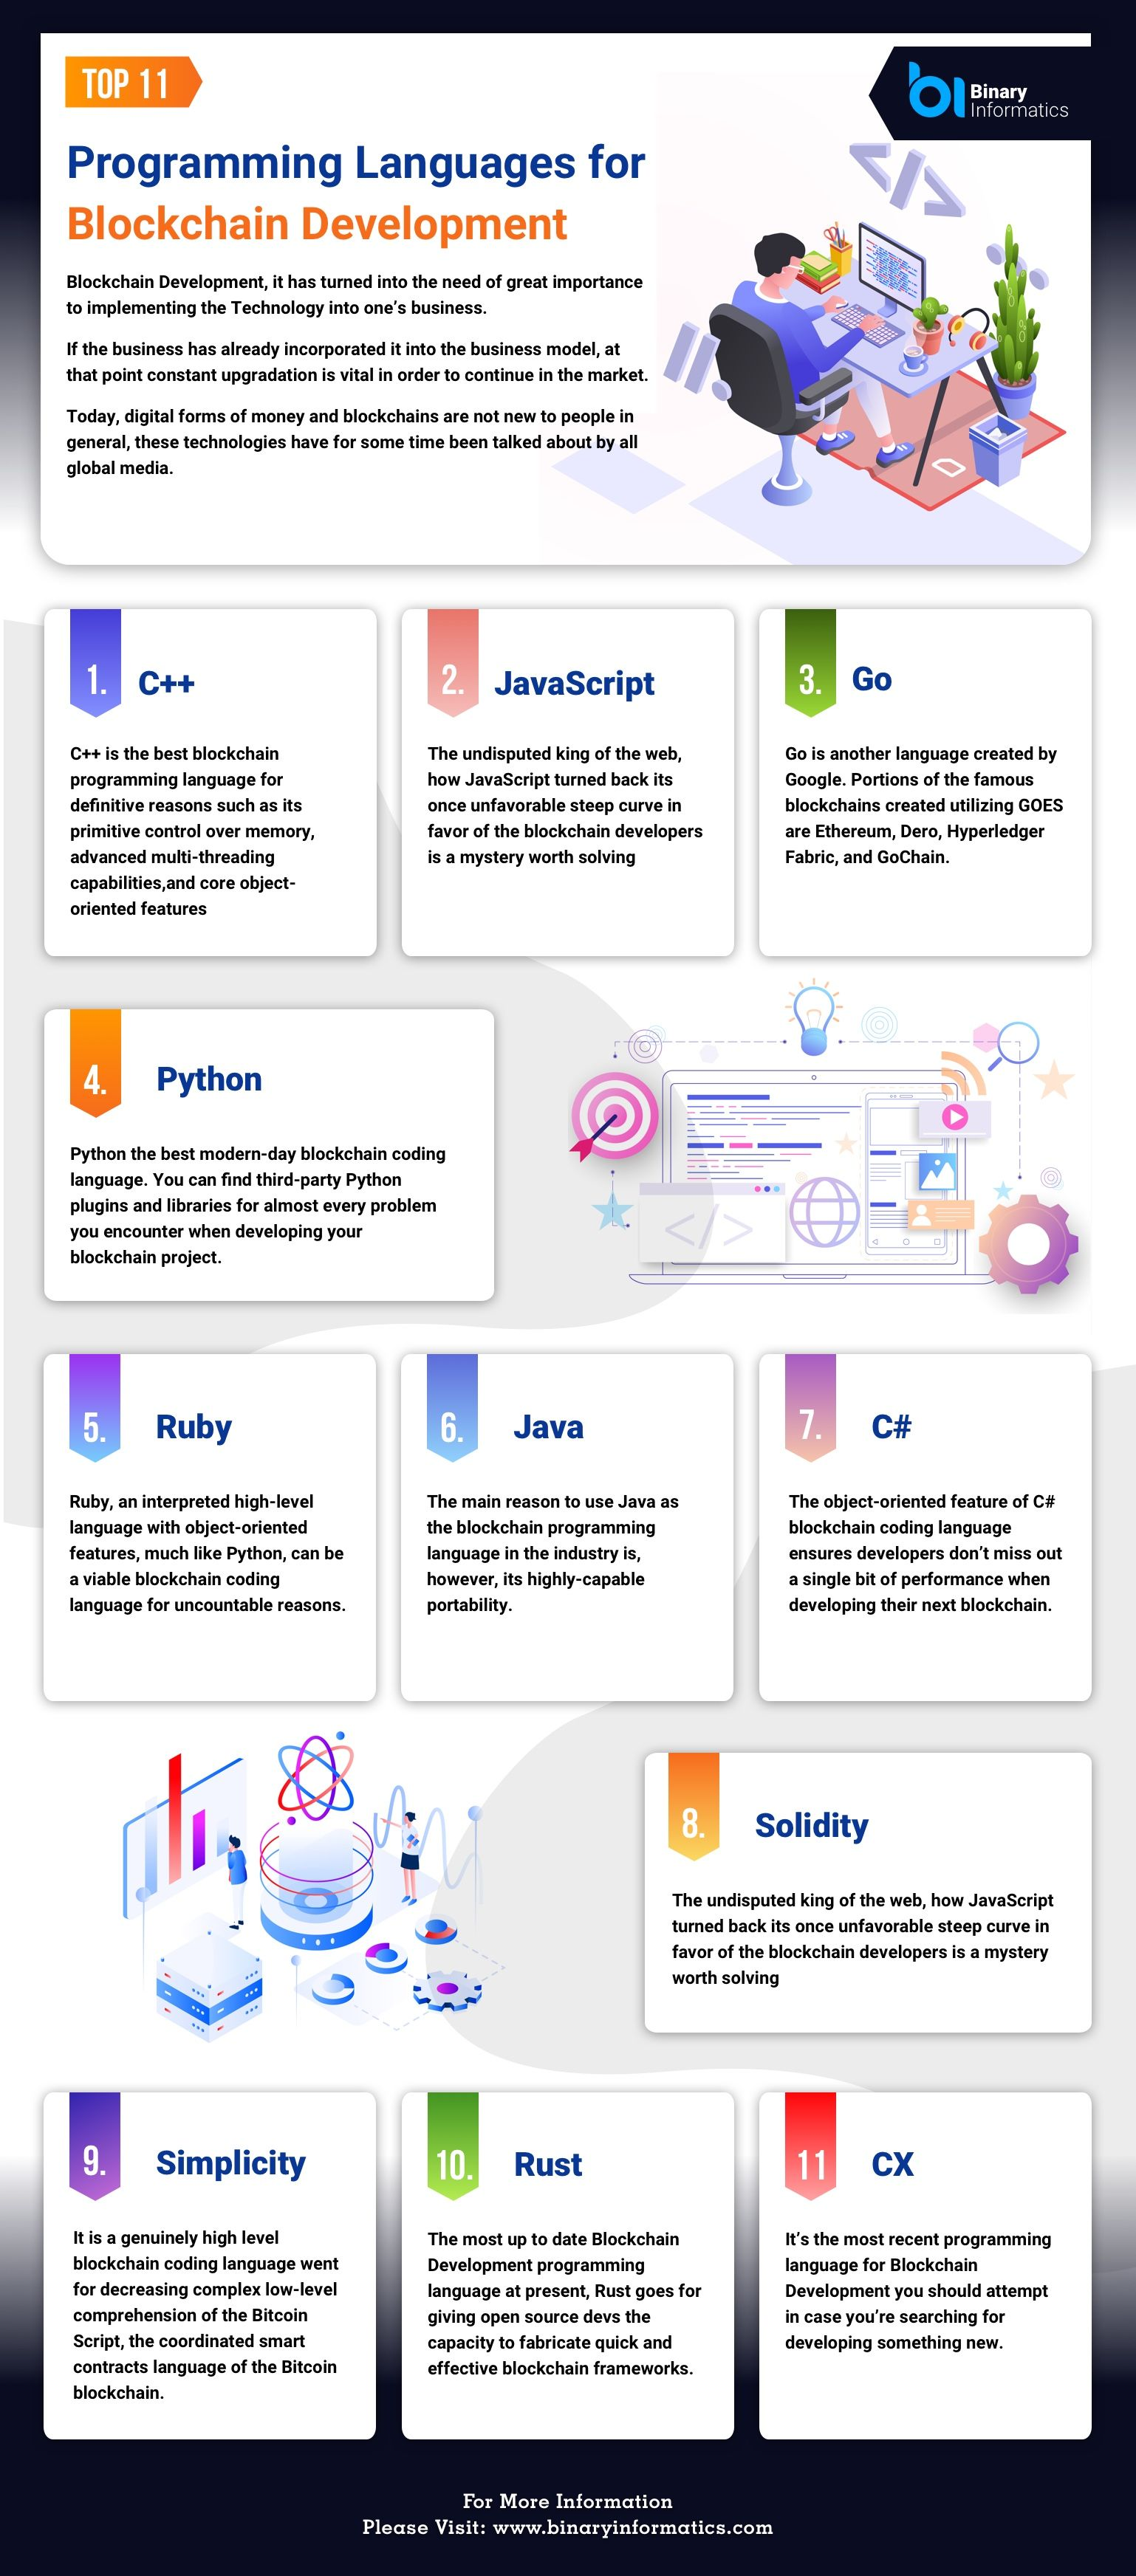 Top 11 Programming Languages For Blockchain Development Blockchain Blockchain Technology Information Technology